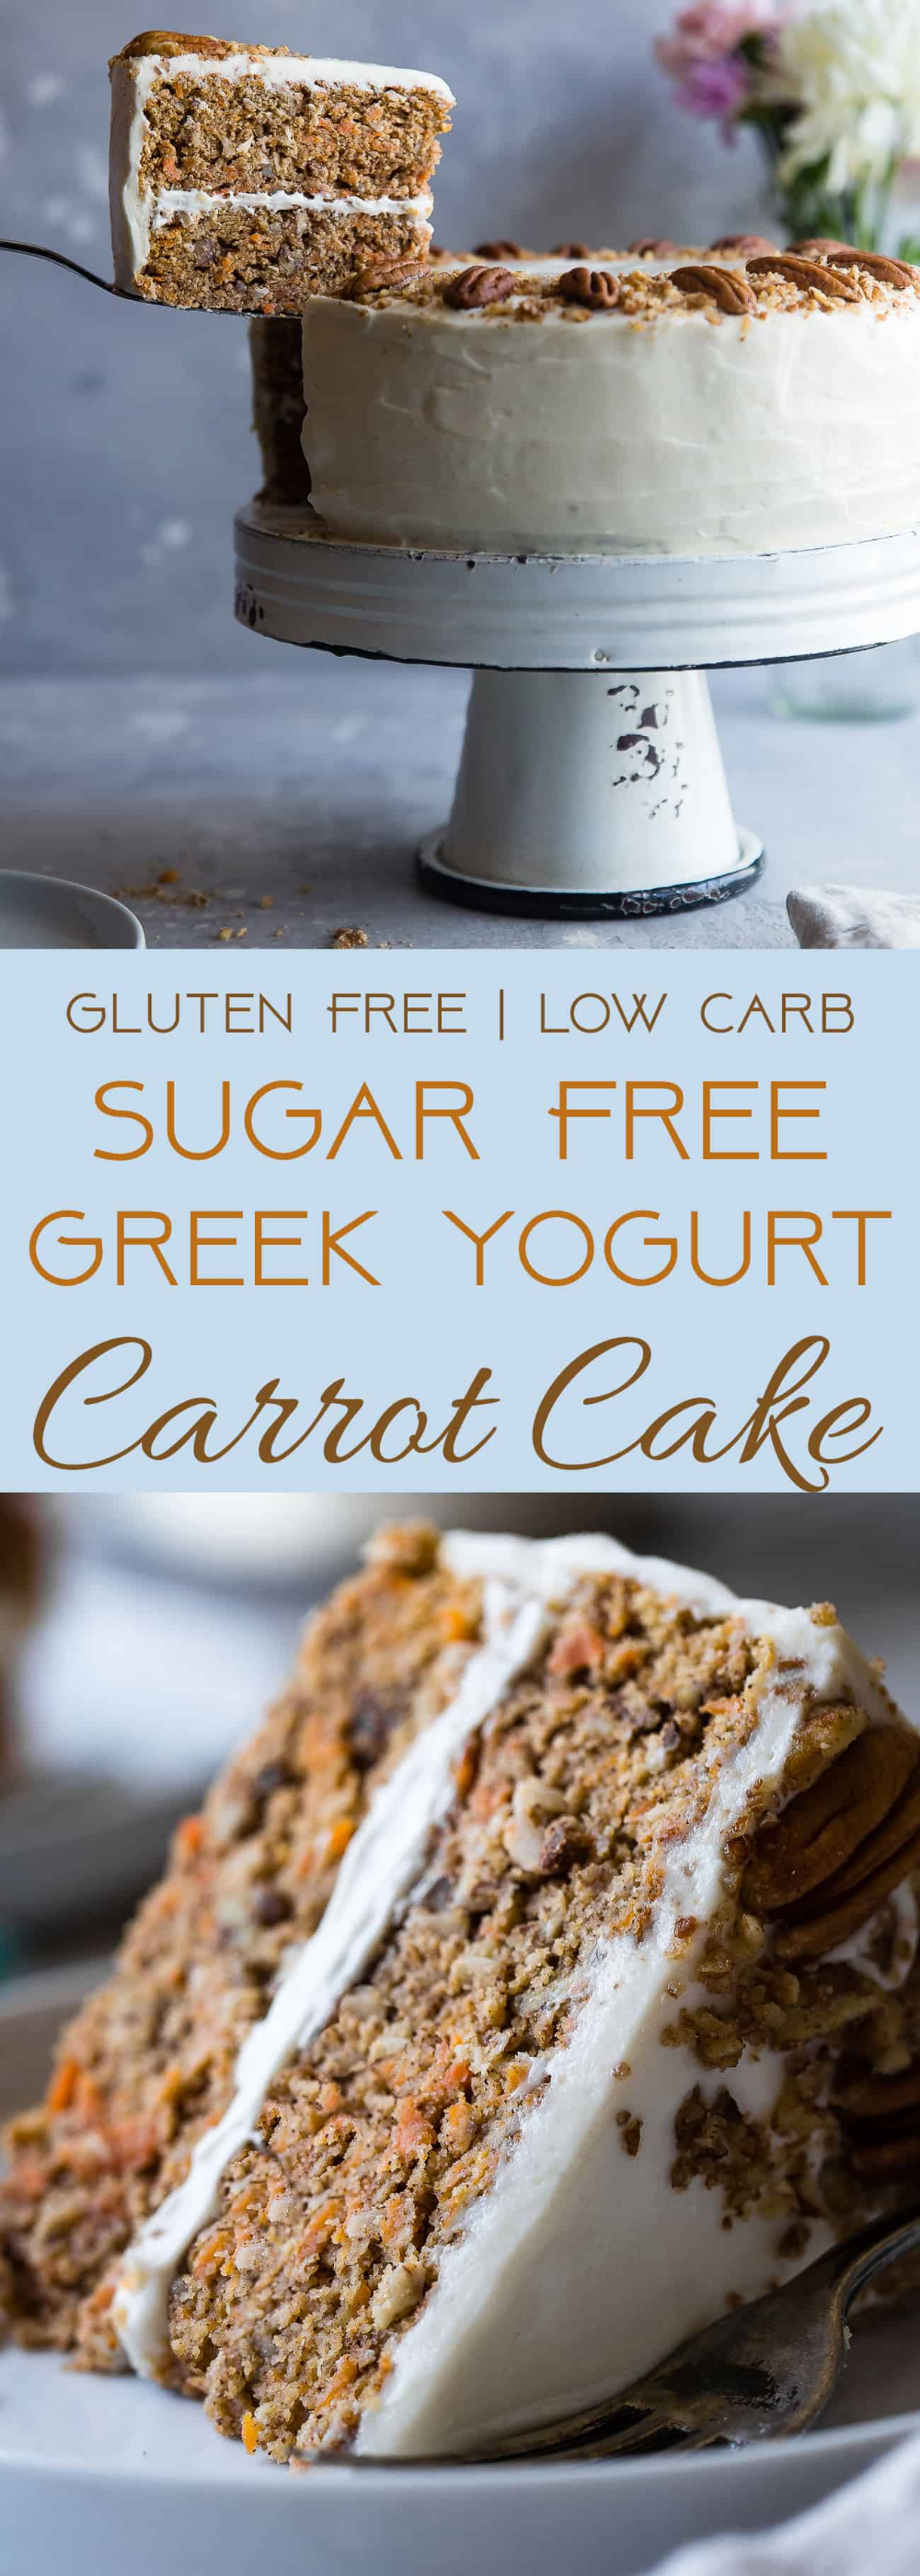 Healthy Gluten Free Sugar Free Carrot Cake | Food Faith Fitness ,  #Cake #Carrot #Faith #Fitness #Fo...